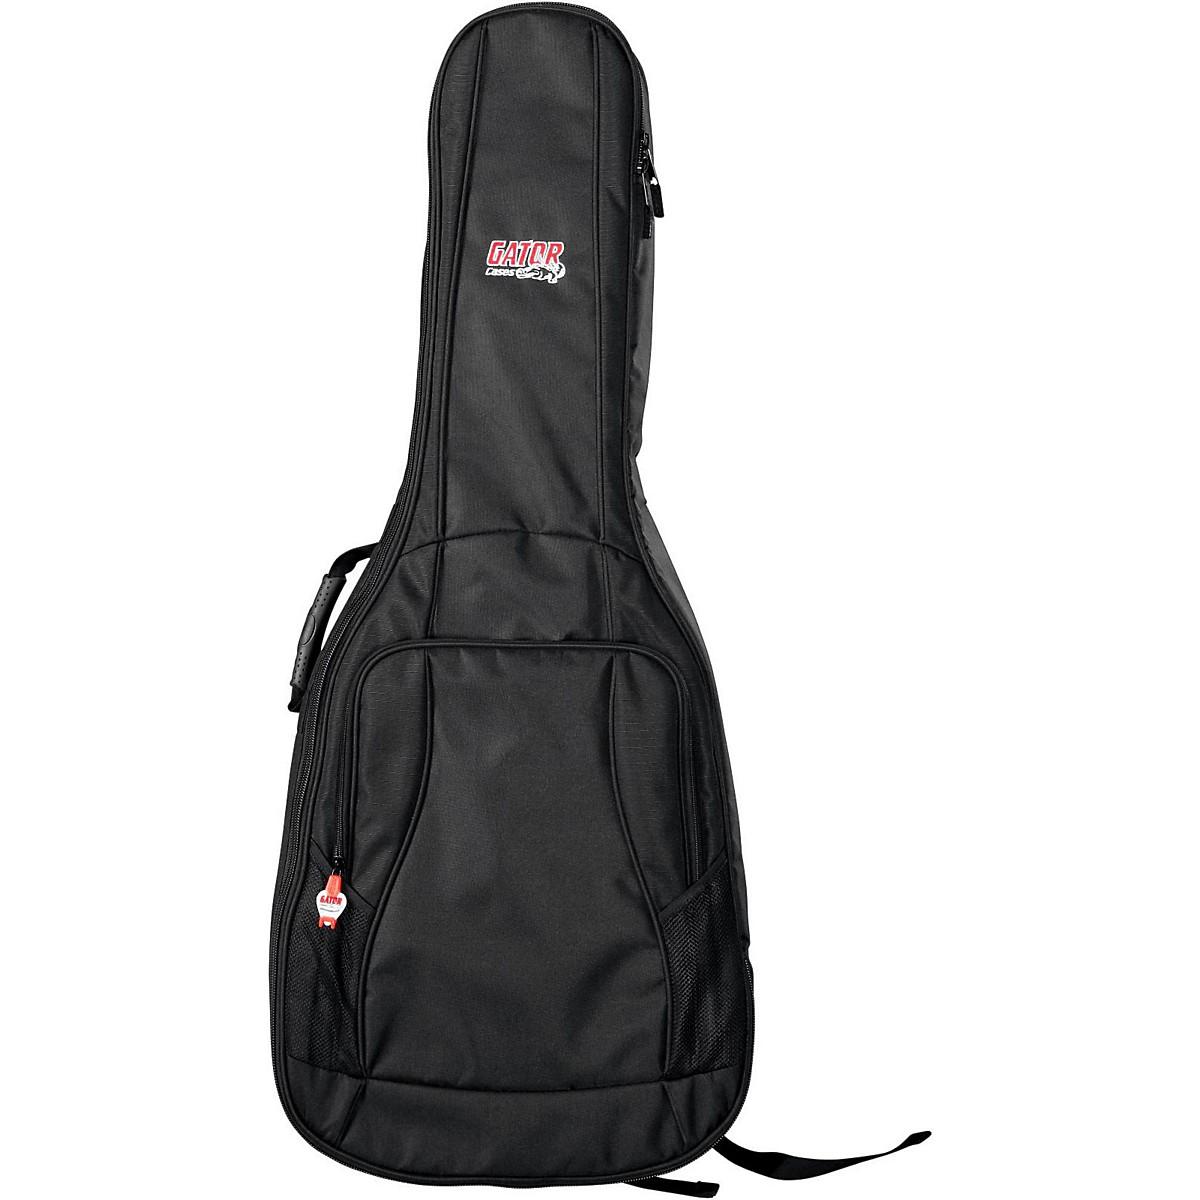 Gator GB-4G ACOUSTIC Series Gig Bag for Acoustic Guitar